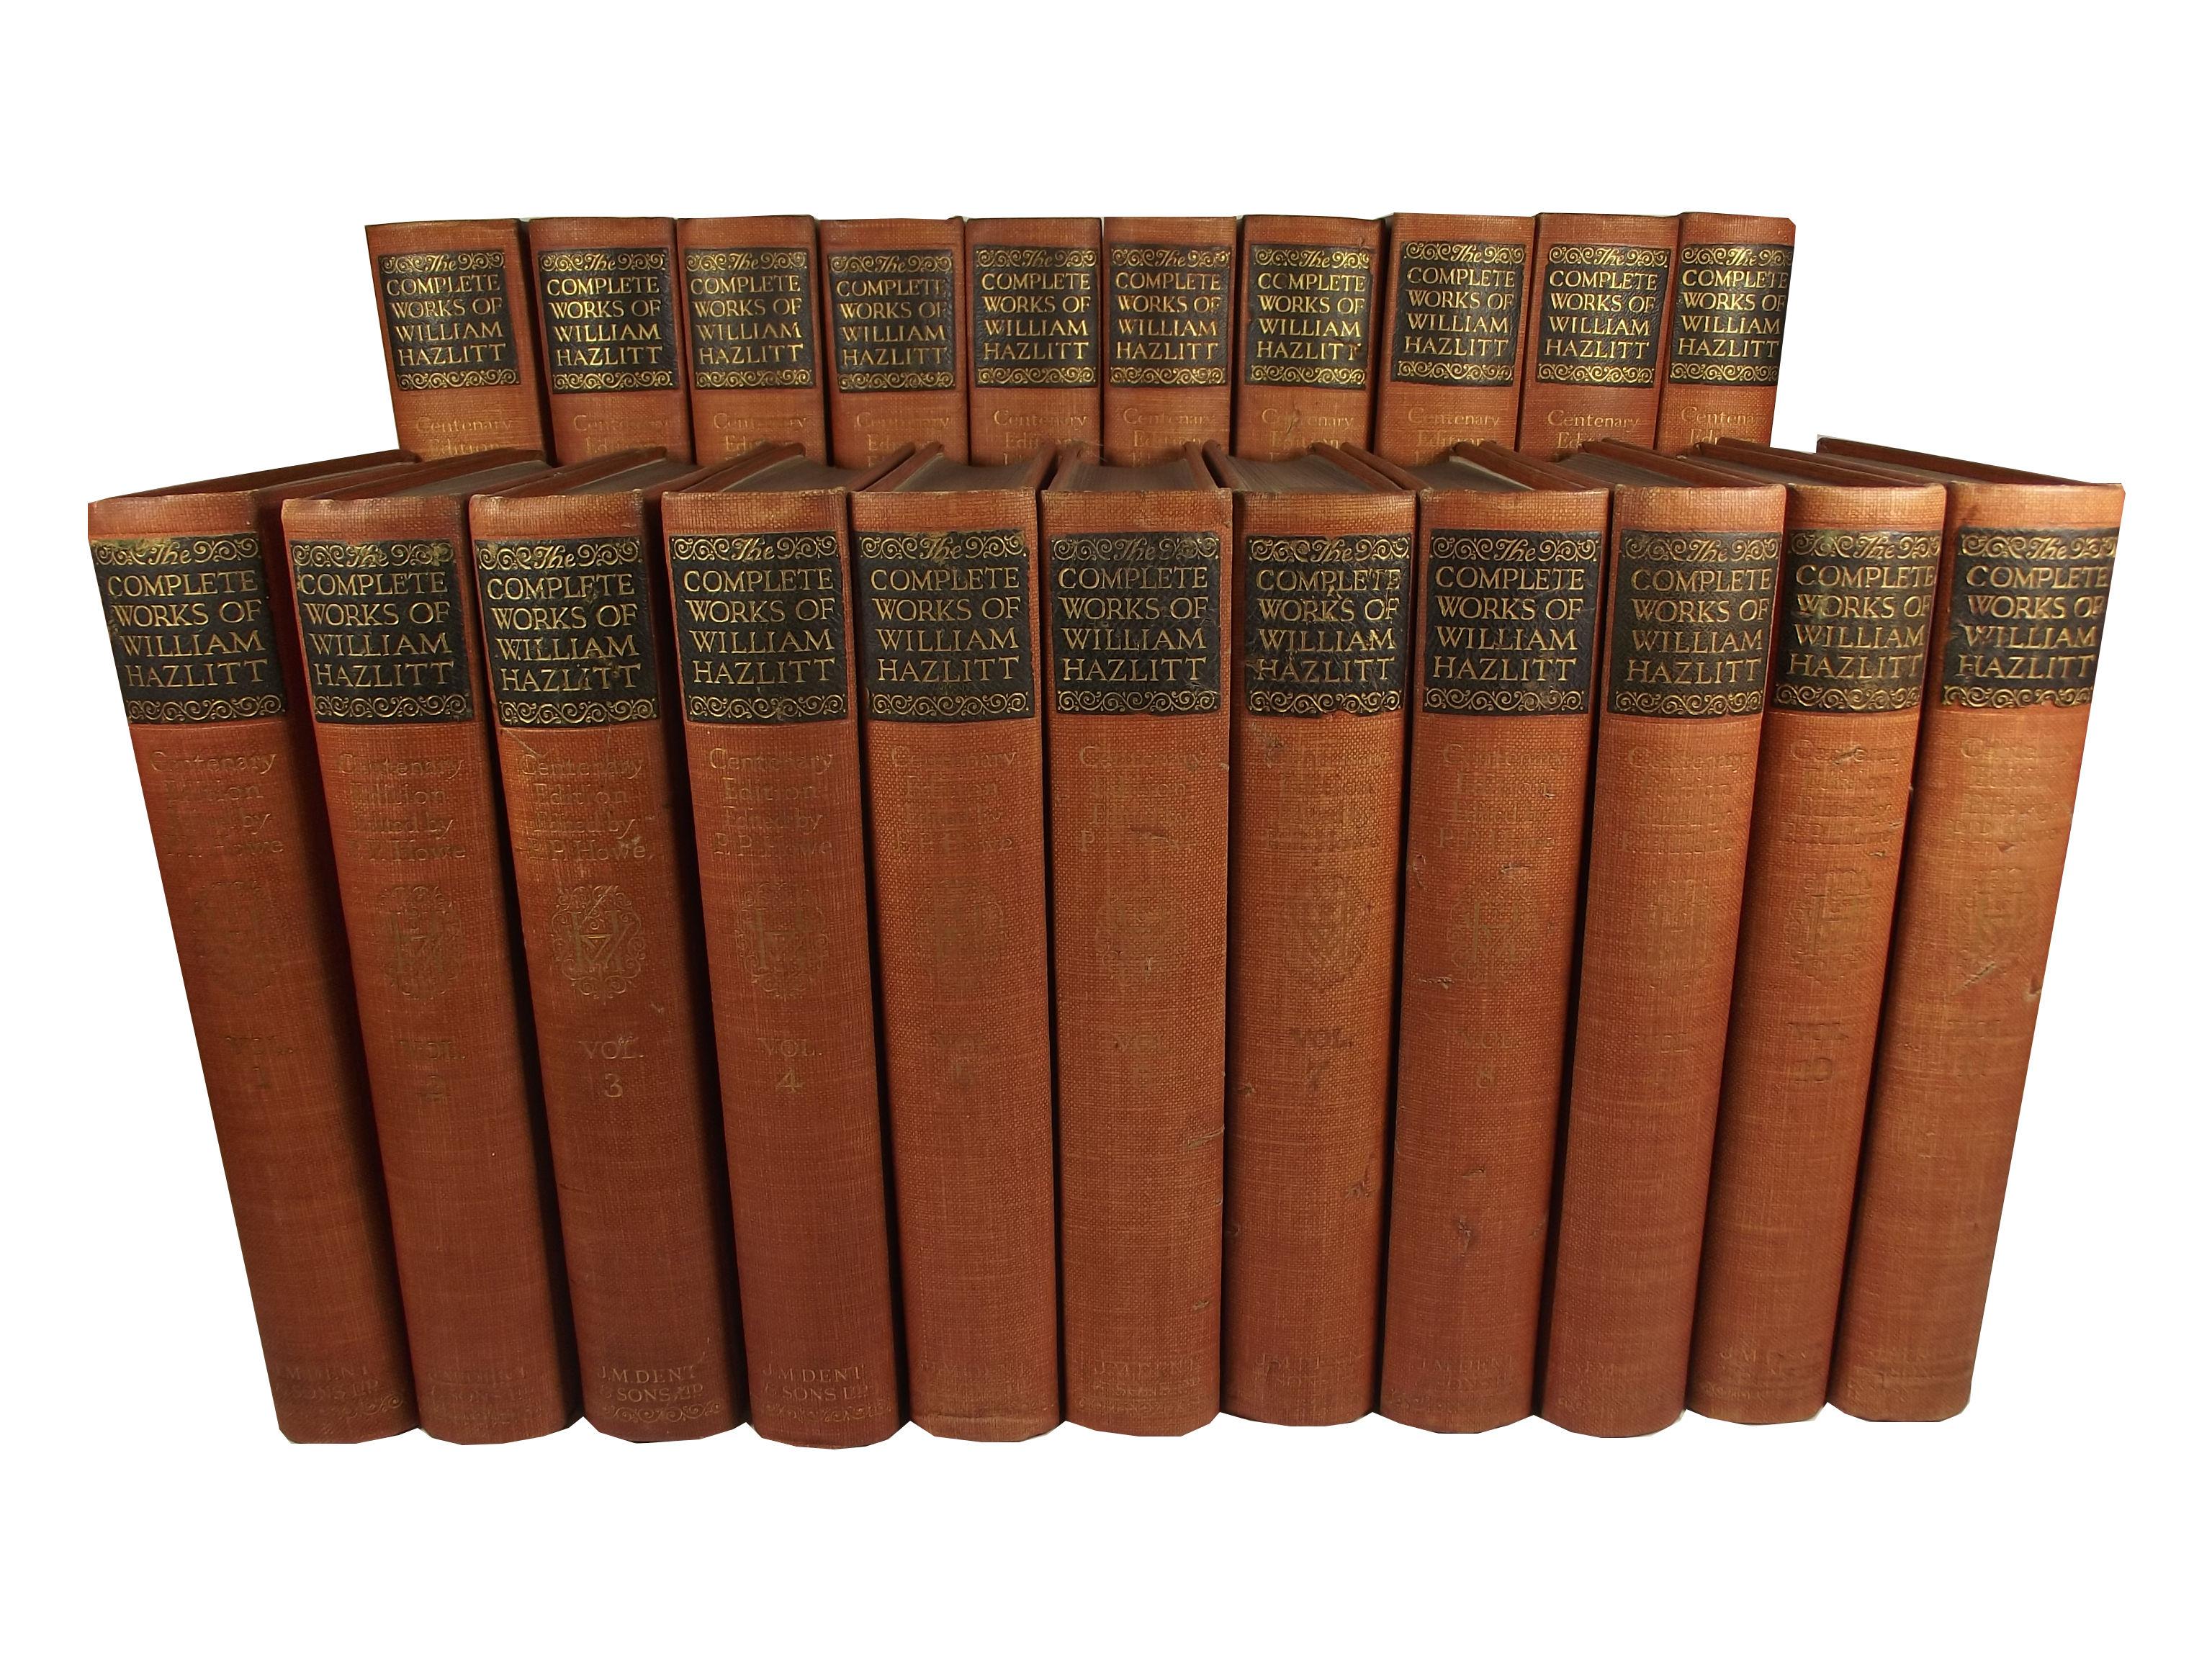 Twenty-two essays of william hazlitt